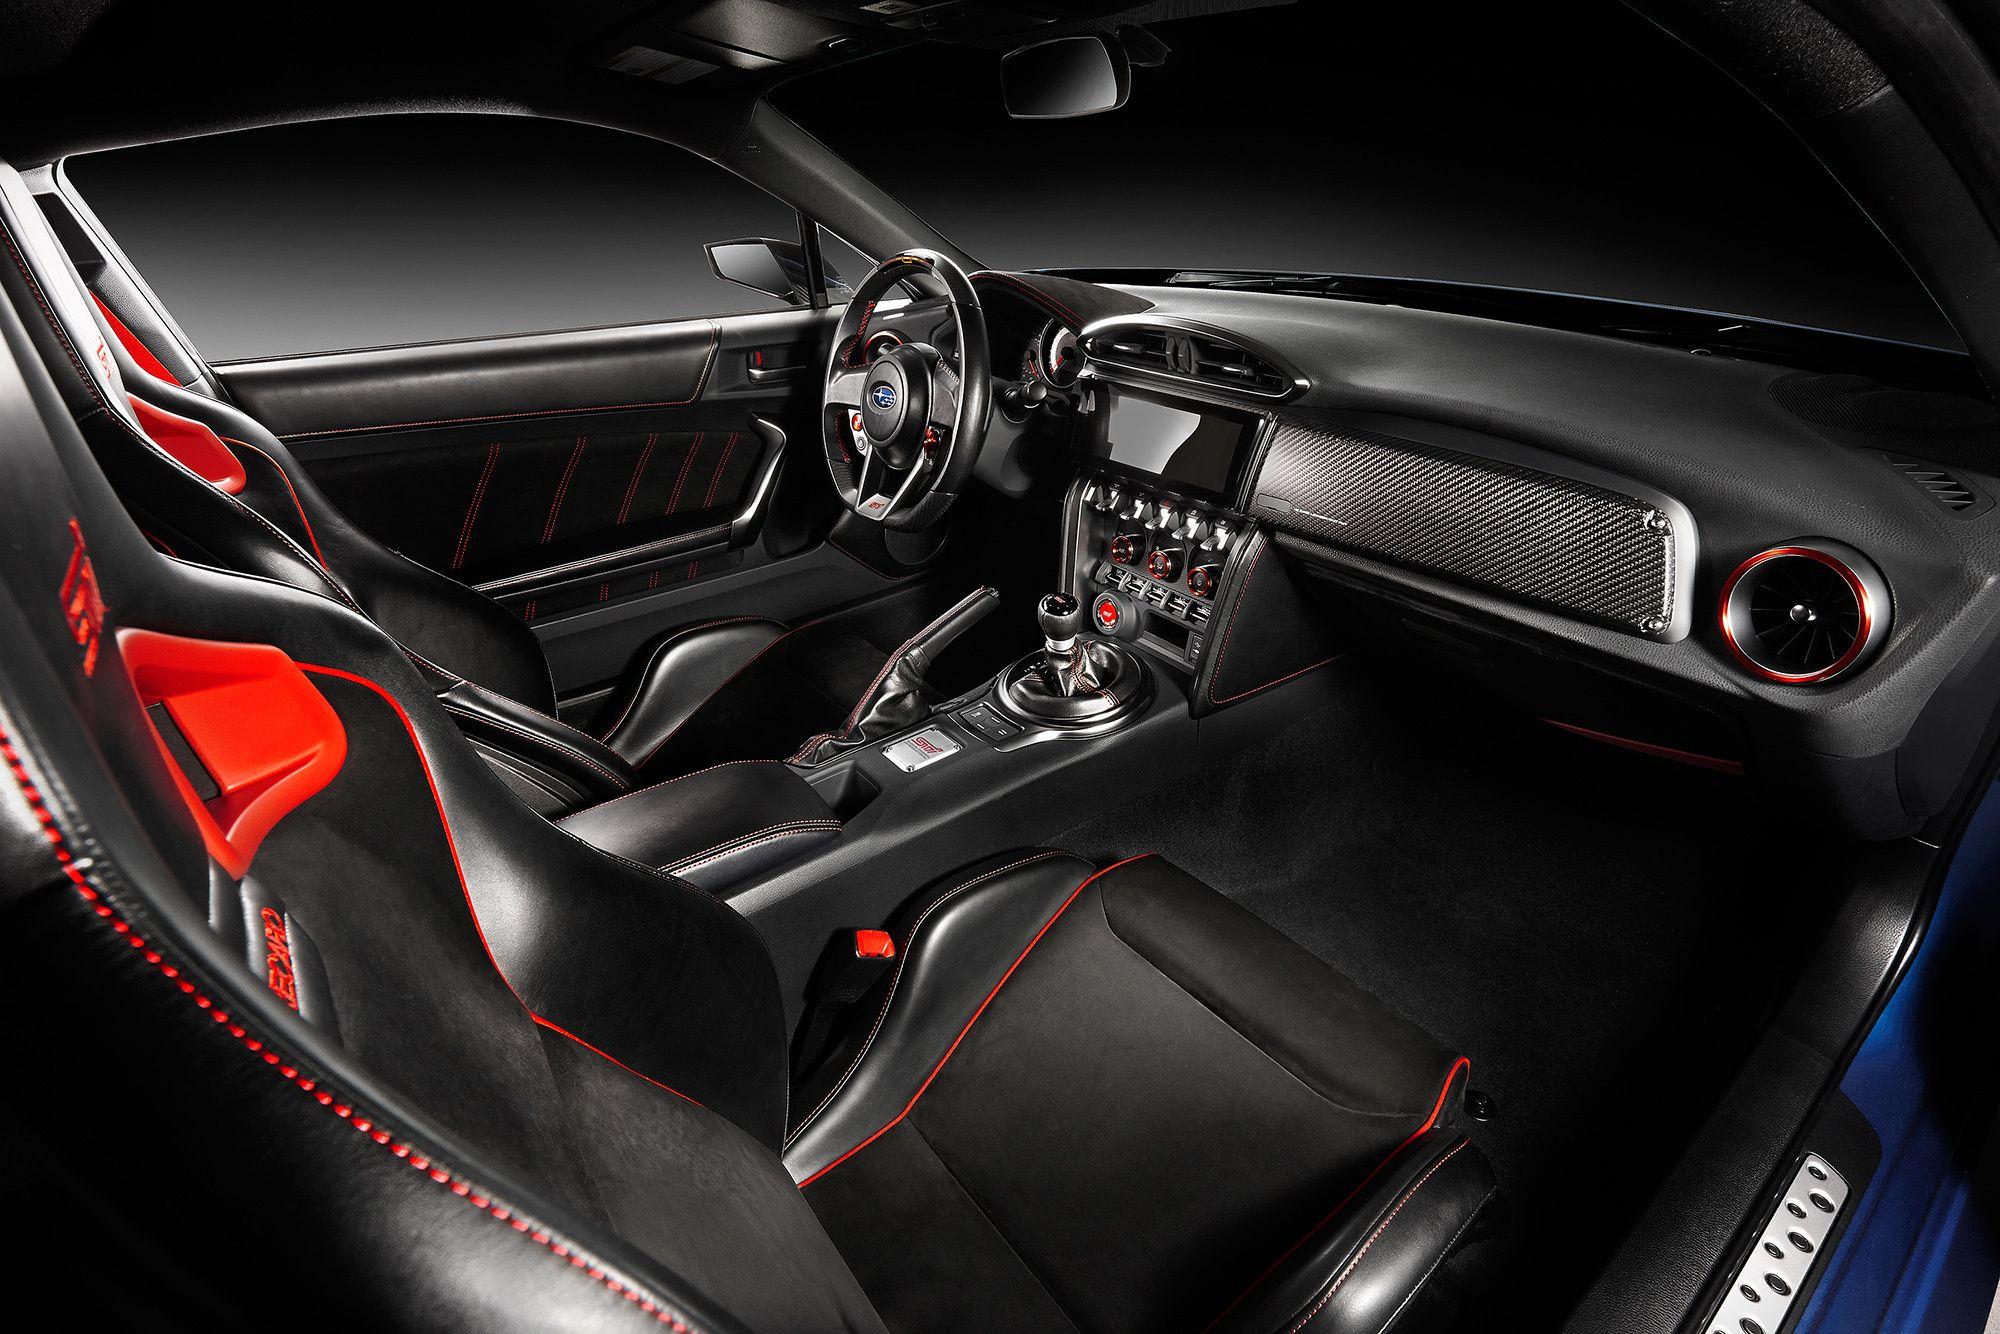 Subaru Brz Interior Automotive Force Pinterest Subaru Concept